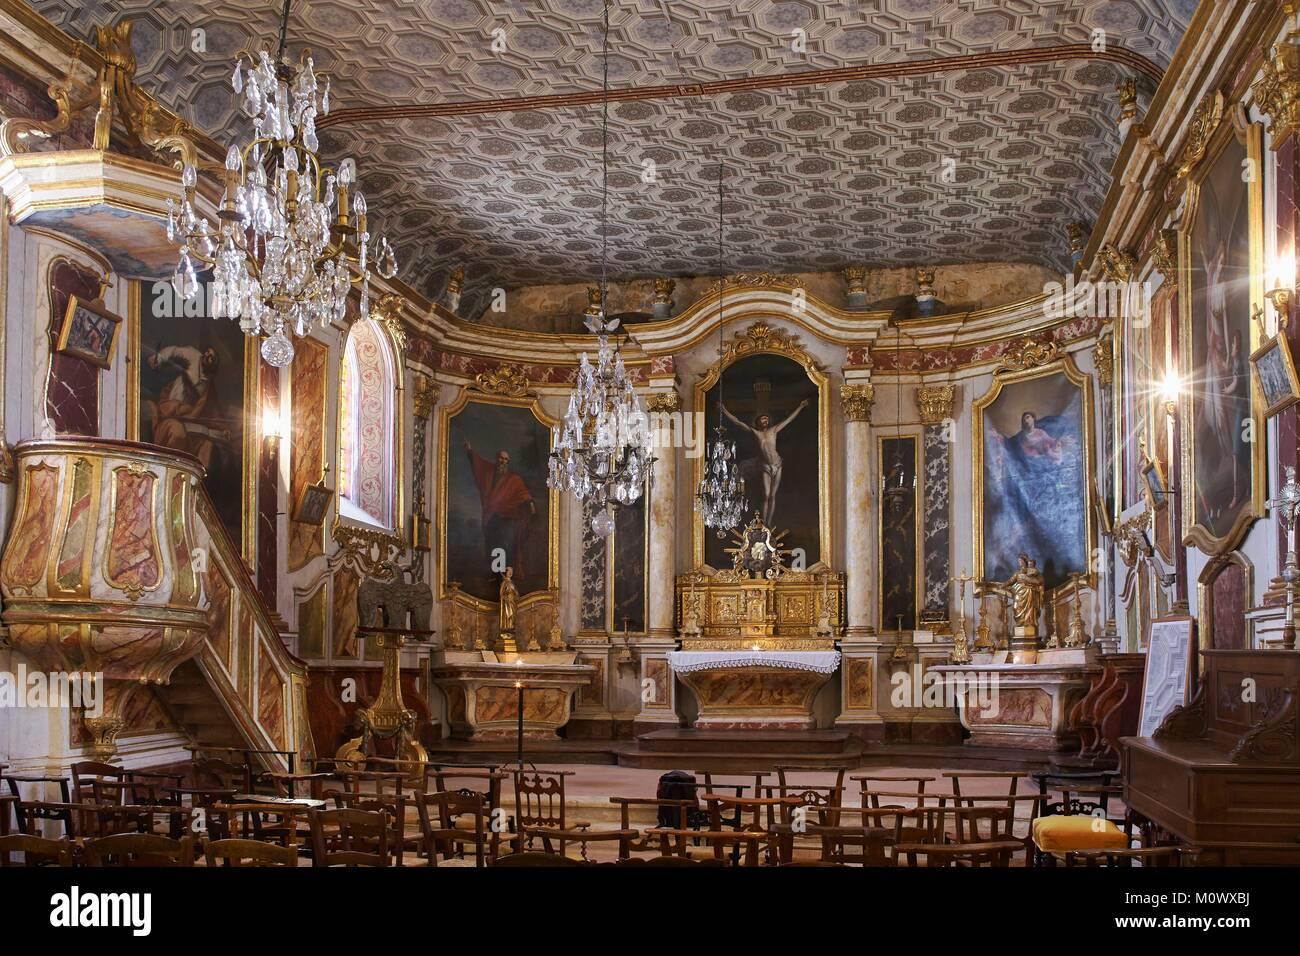 France,Tarn et Garonne,Lachapelle,Interior decoration of St Peter's Church - Stock Image